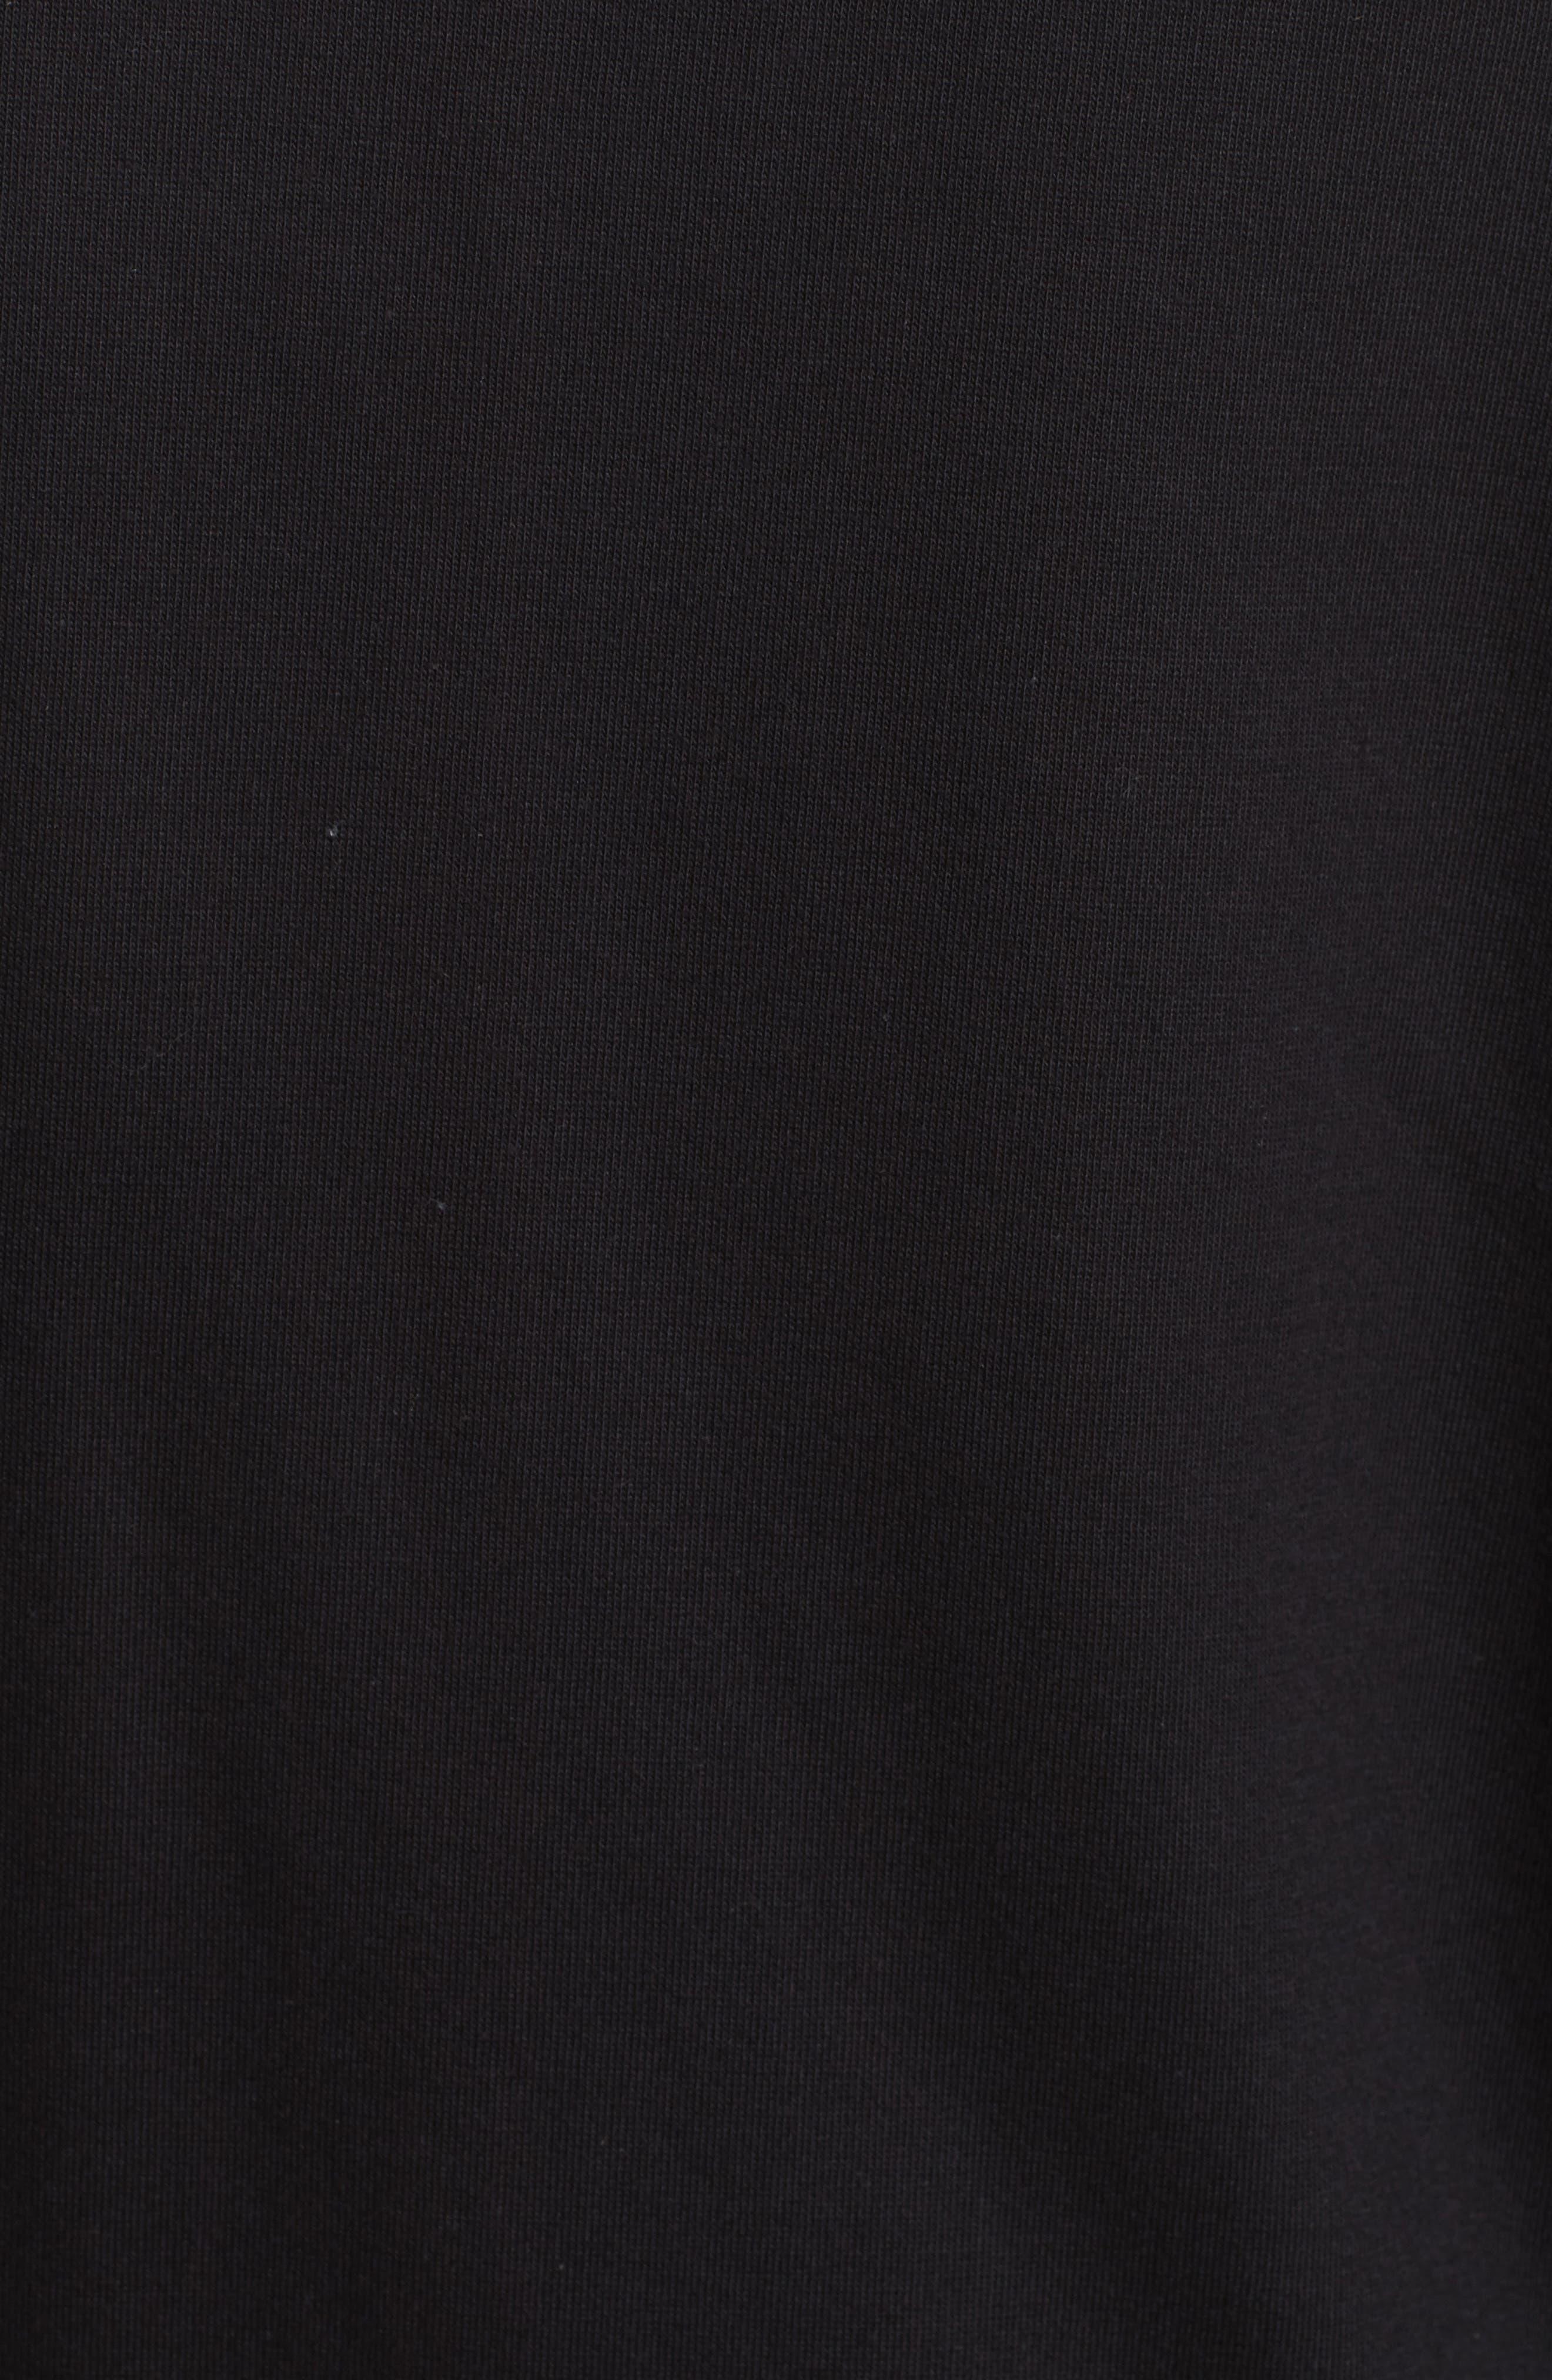 Rockstud Scalloped Sweatshirt,                             Alternate thumbnail 6, color,                             001